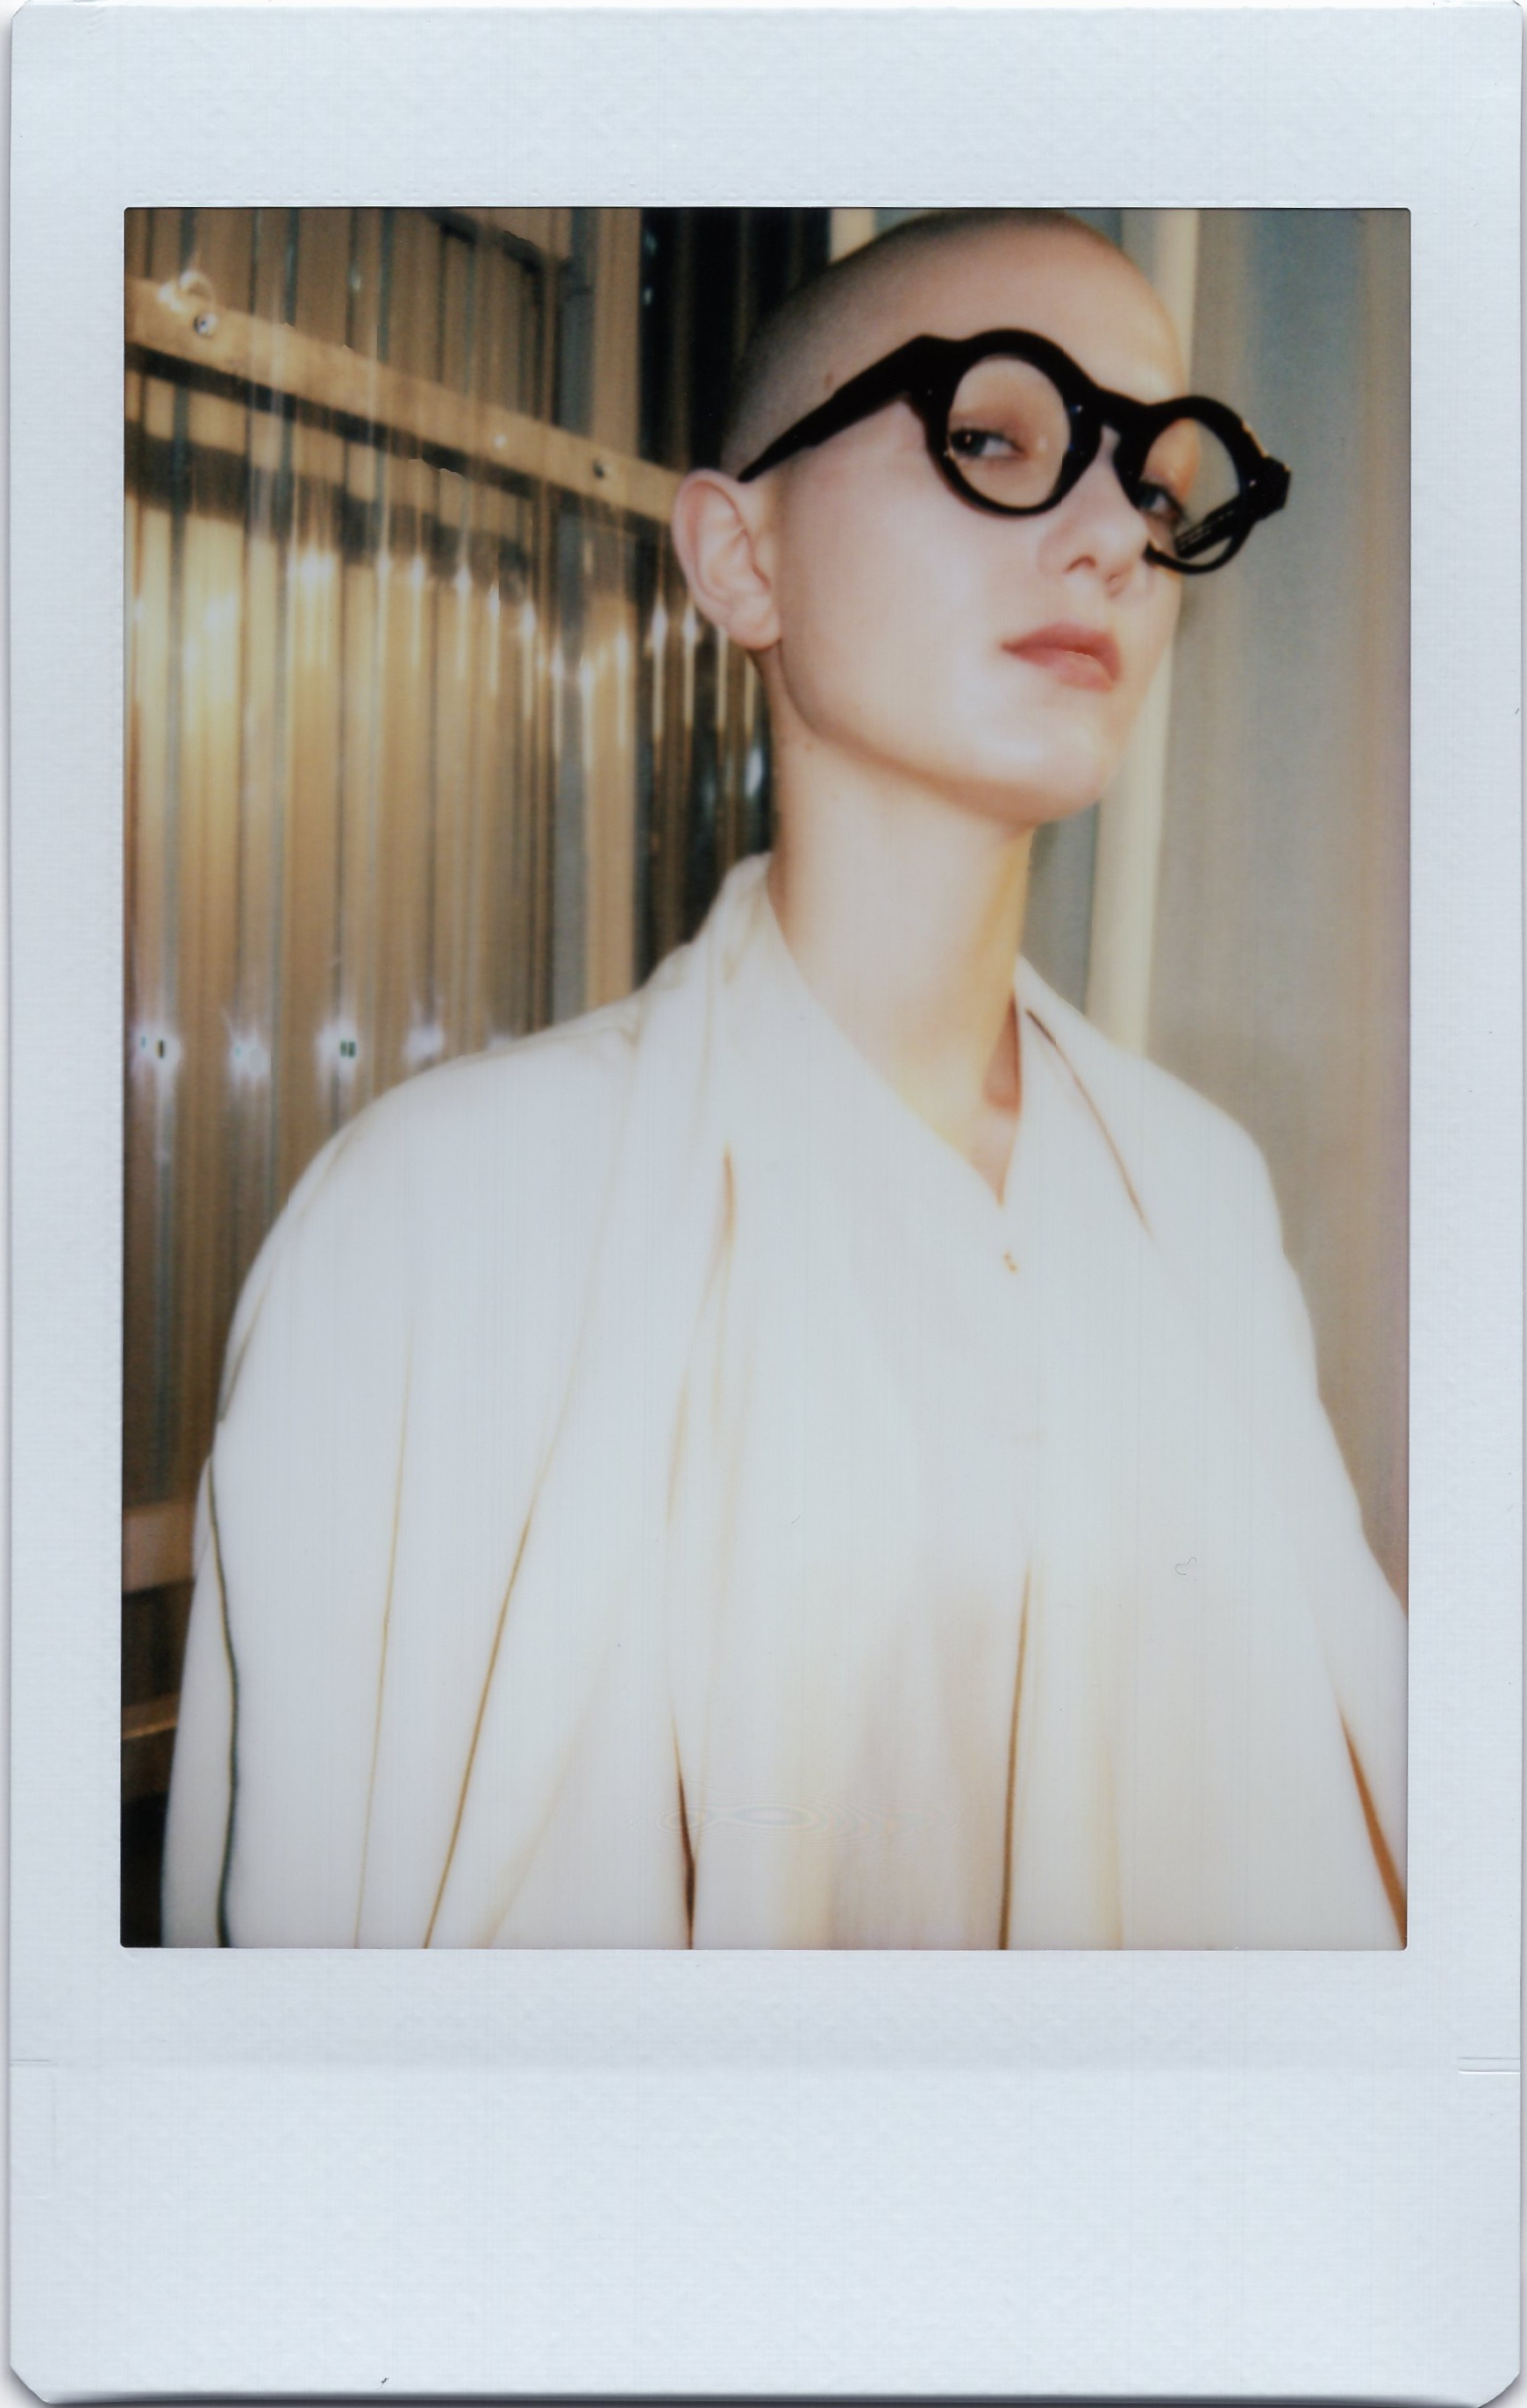 UmaWang_Honigschreck_Polaroid_6.jpg